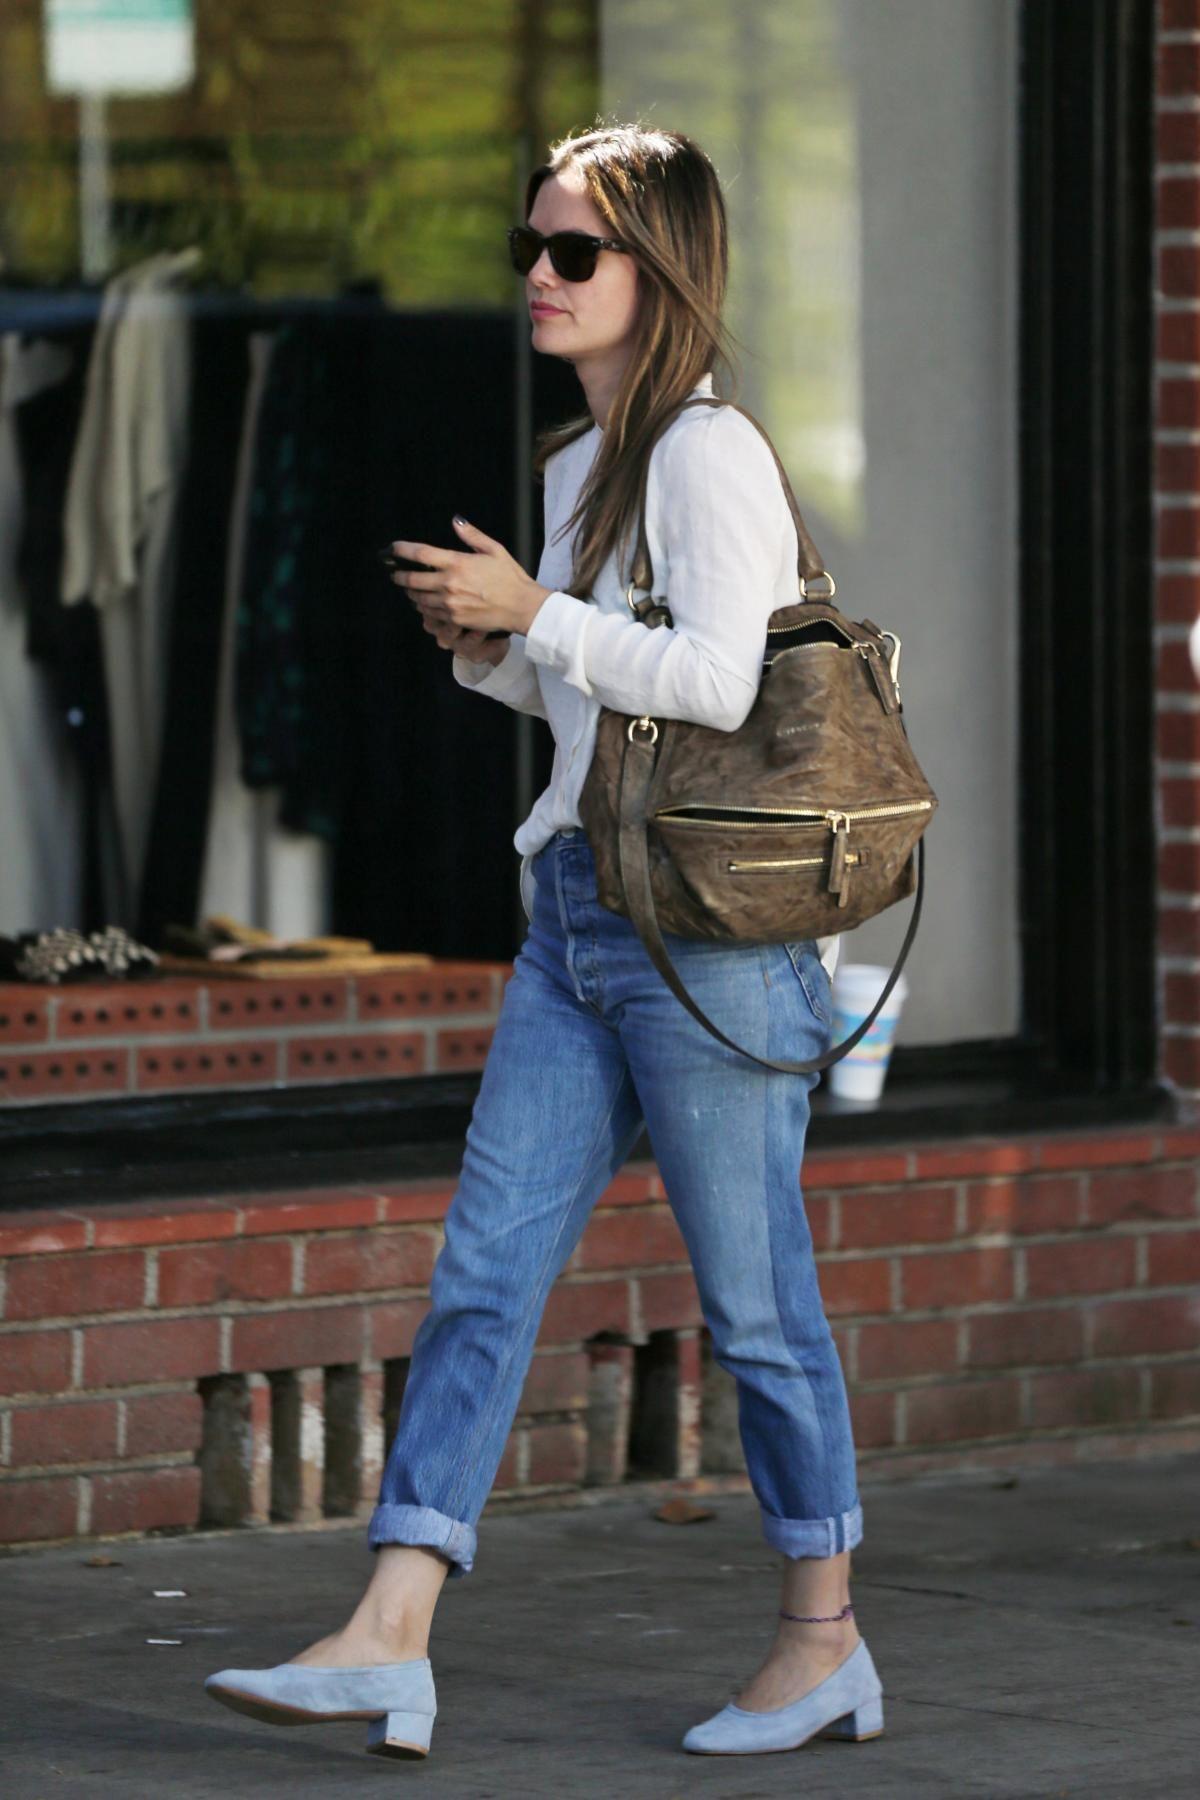 b1f3cd281ed3 Rachel Bilson wearing Givenchy Pandora Bag and Ray-Ban Rb4105 710 Wayfarer  Folding Classic Sunglasses